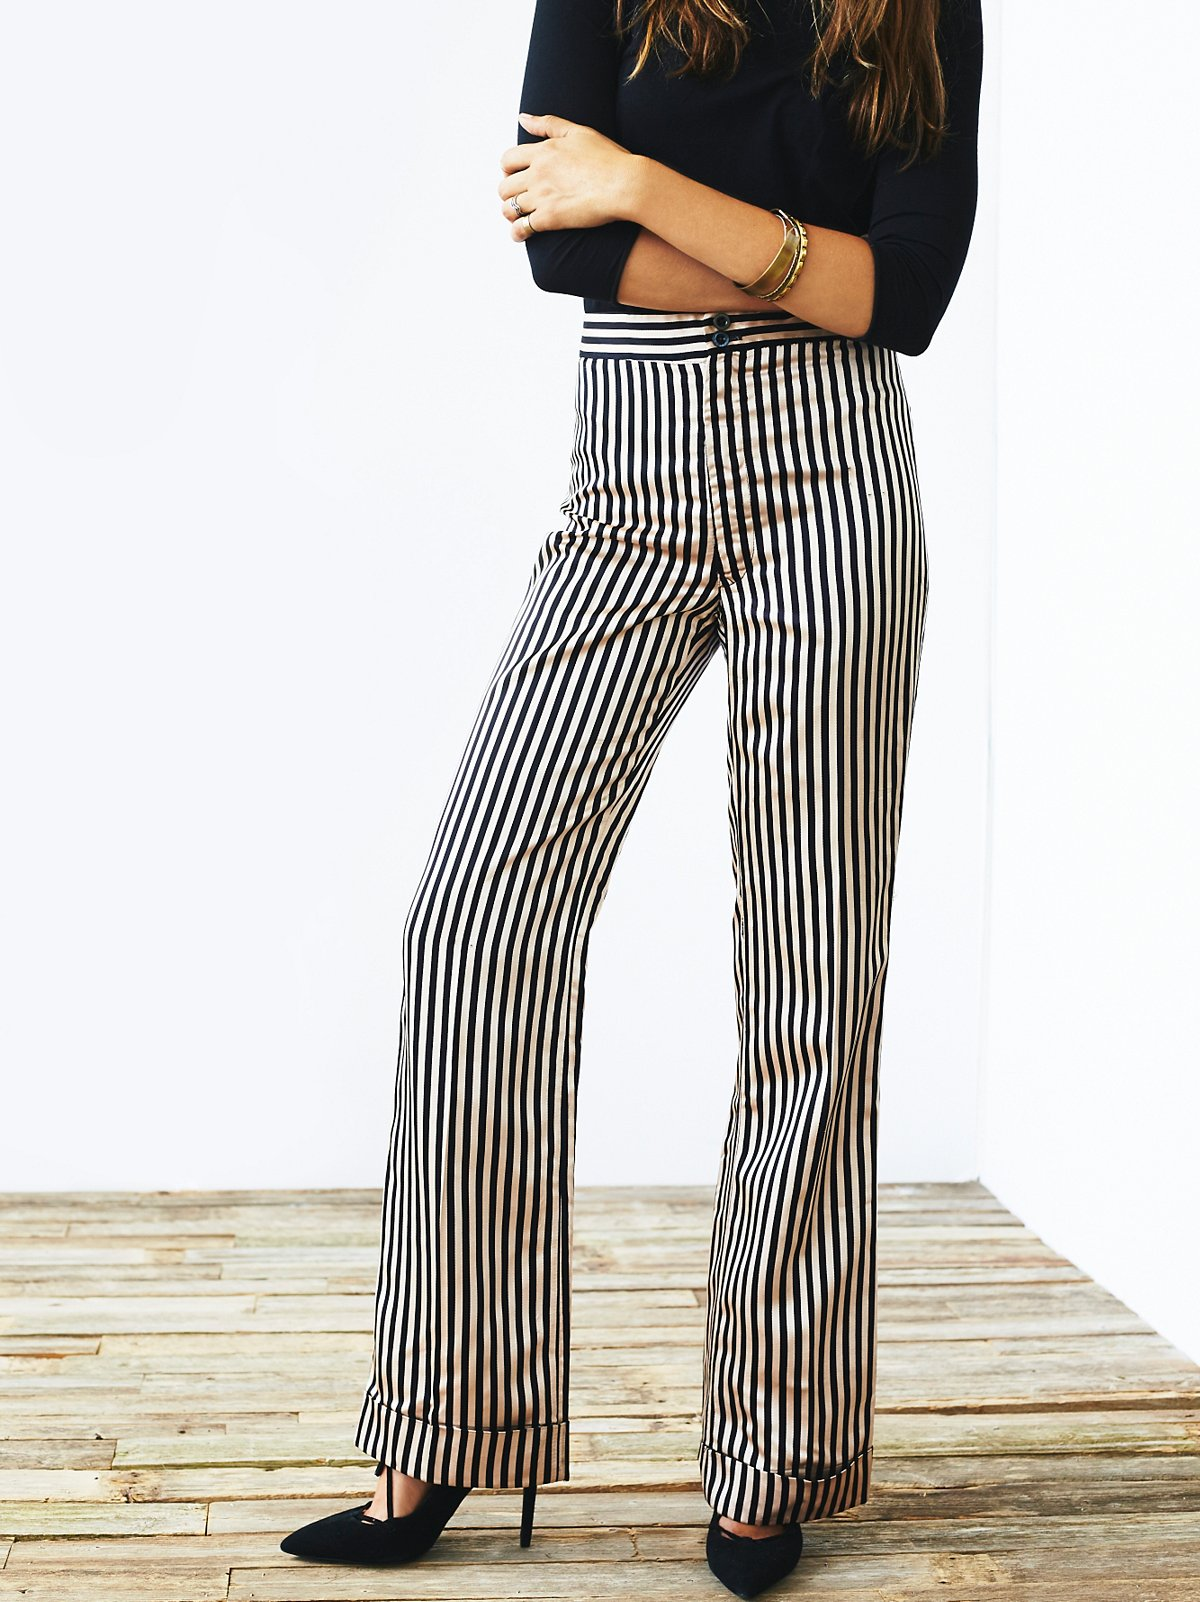 Vintage 1970s Striped Pants